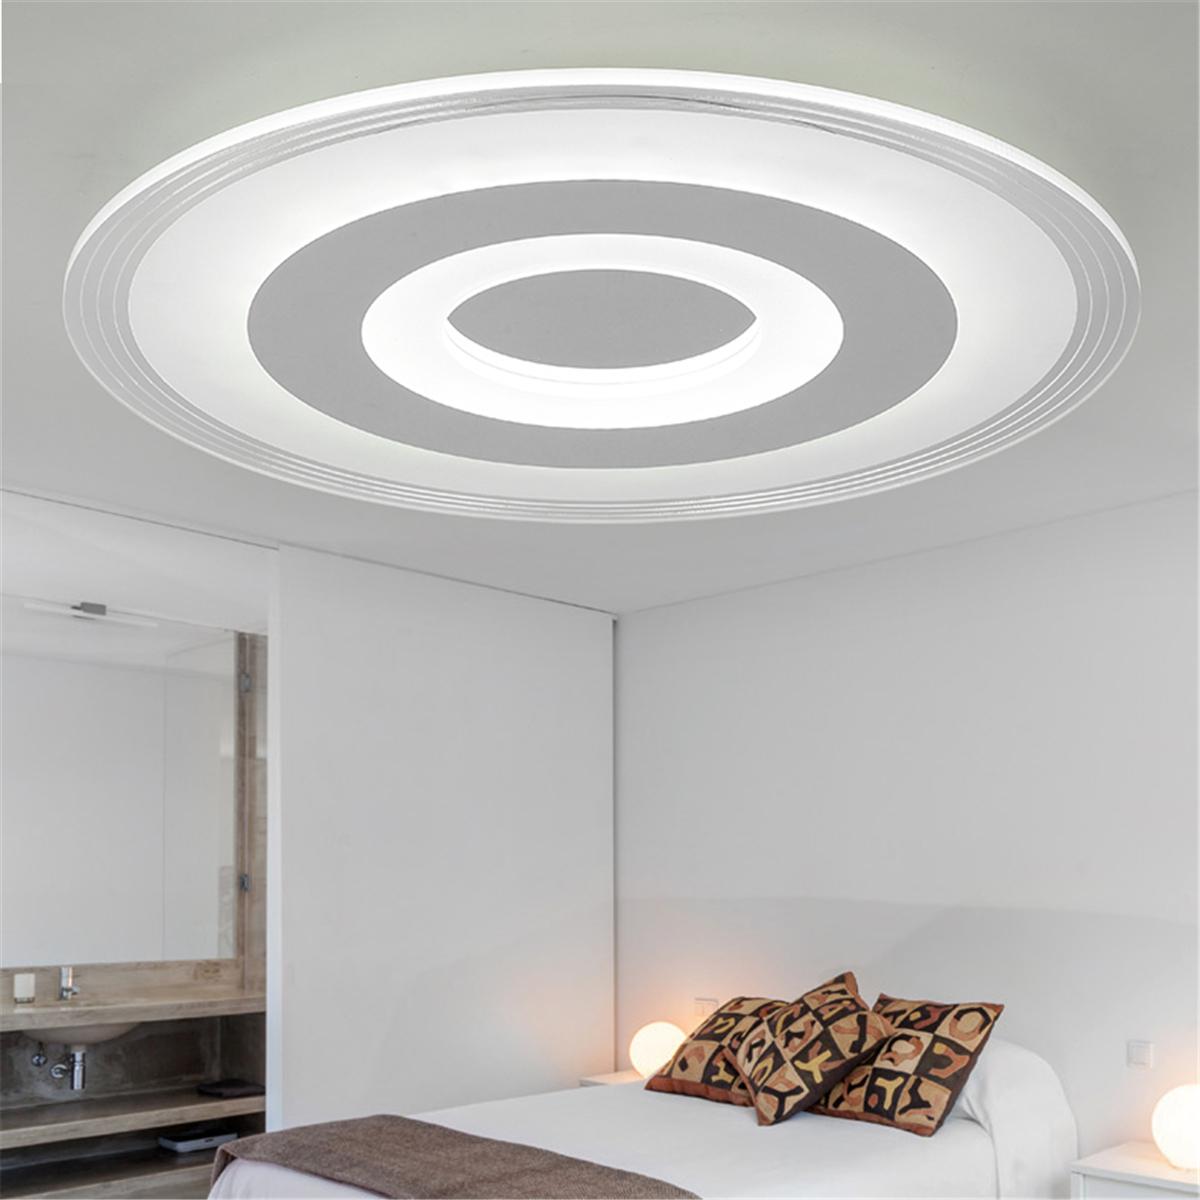 Large Modern Round LED Ceiling Light Lamp Home Living Room